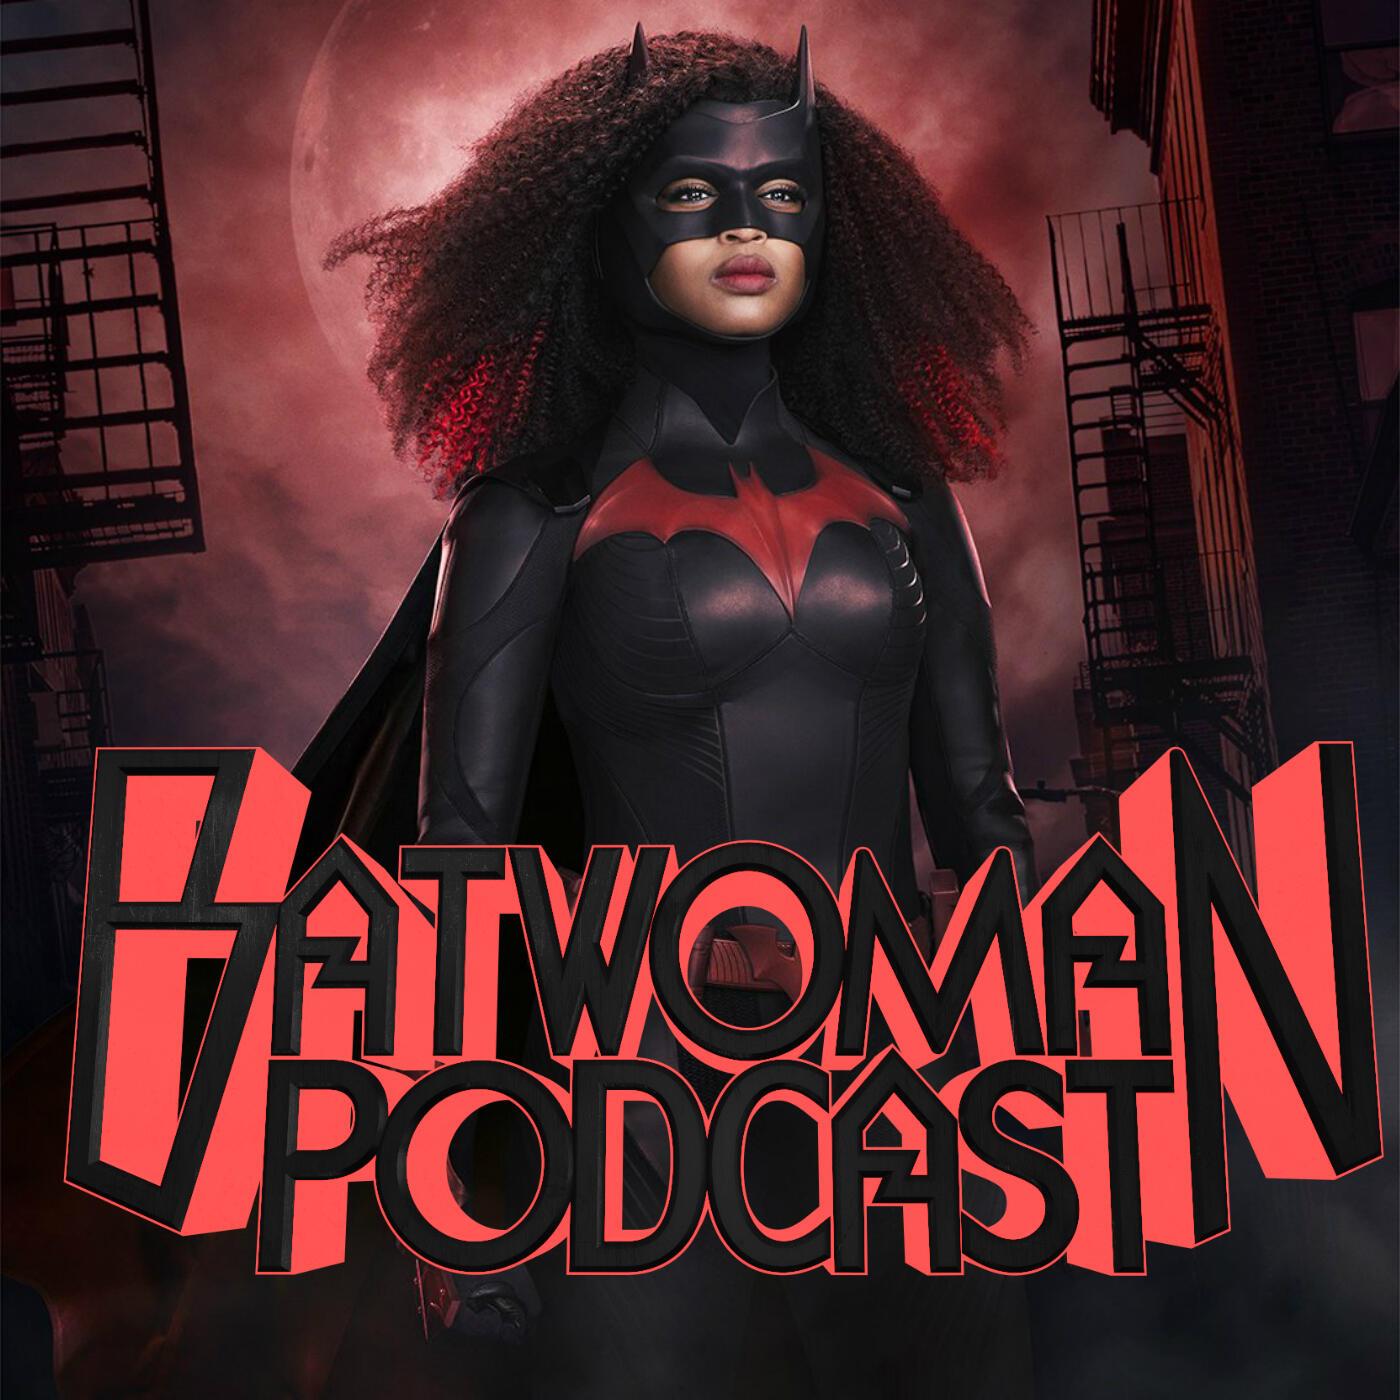 Batwoman Podcast